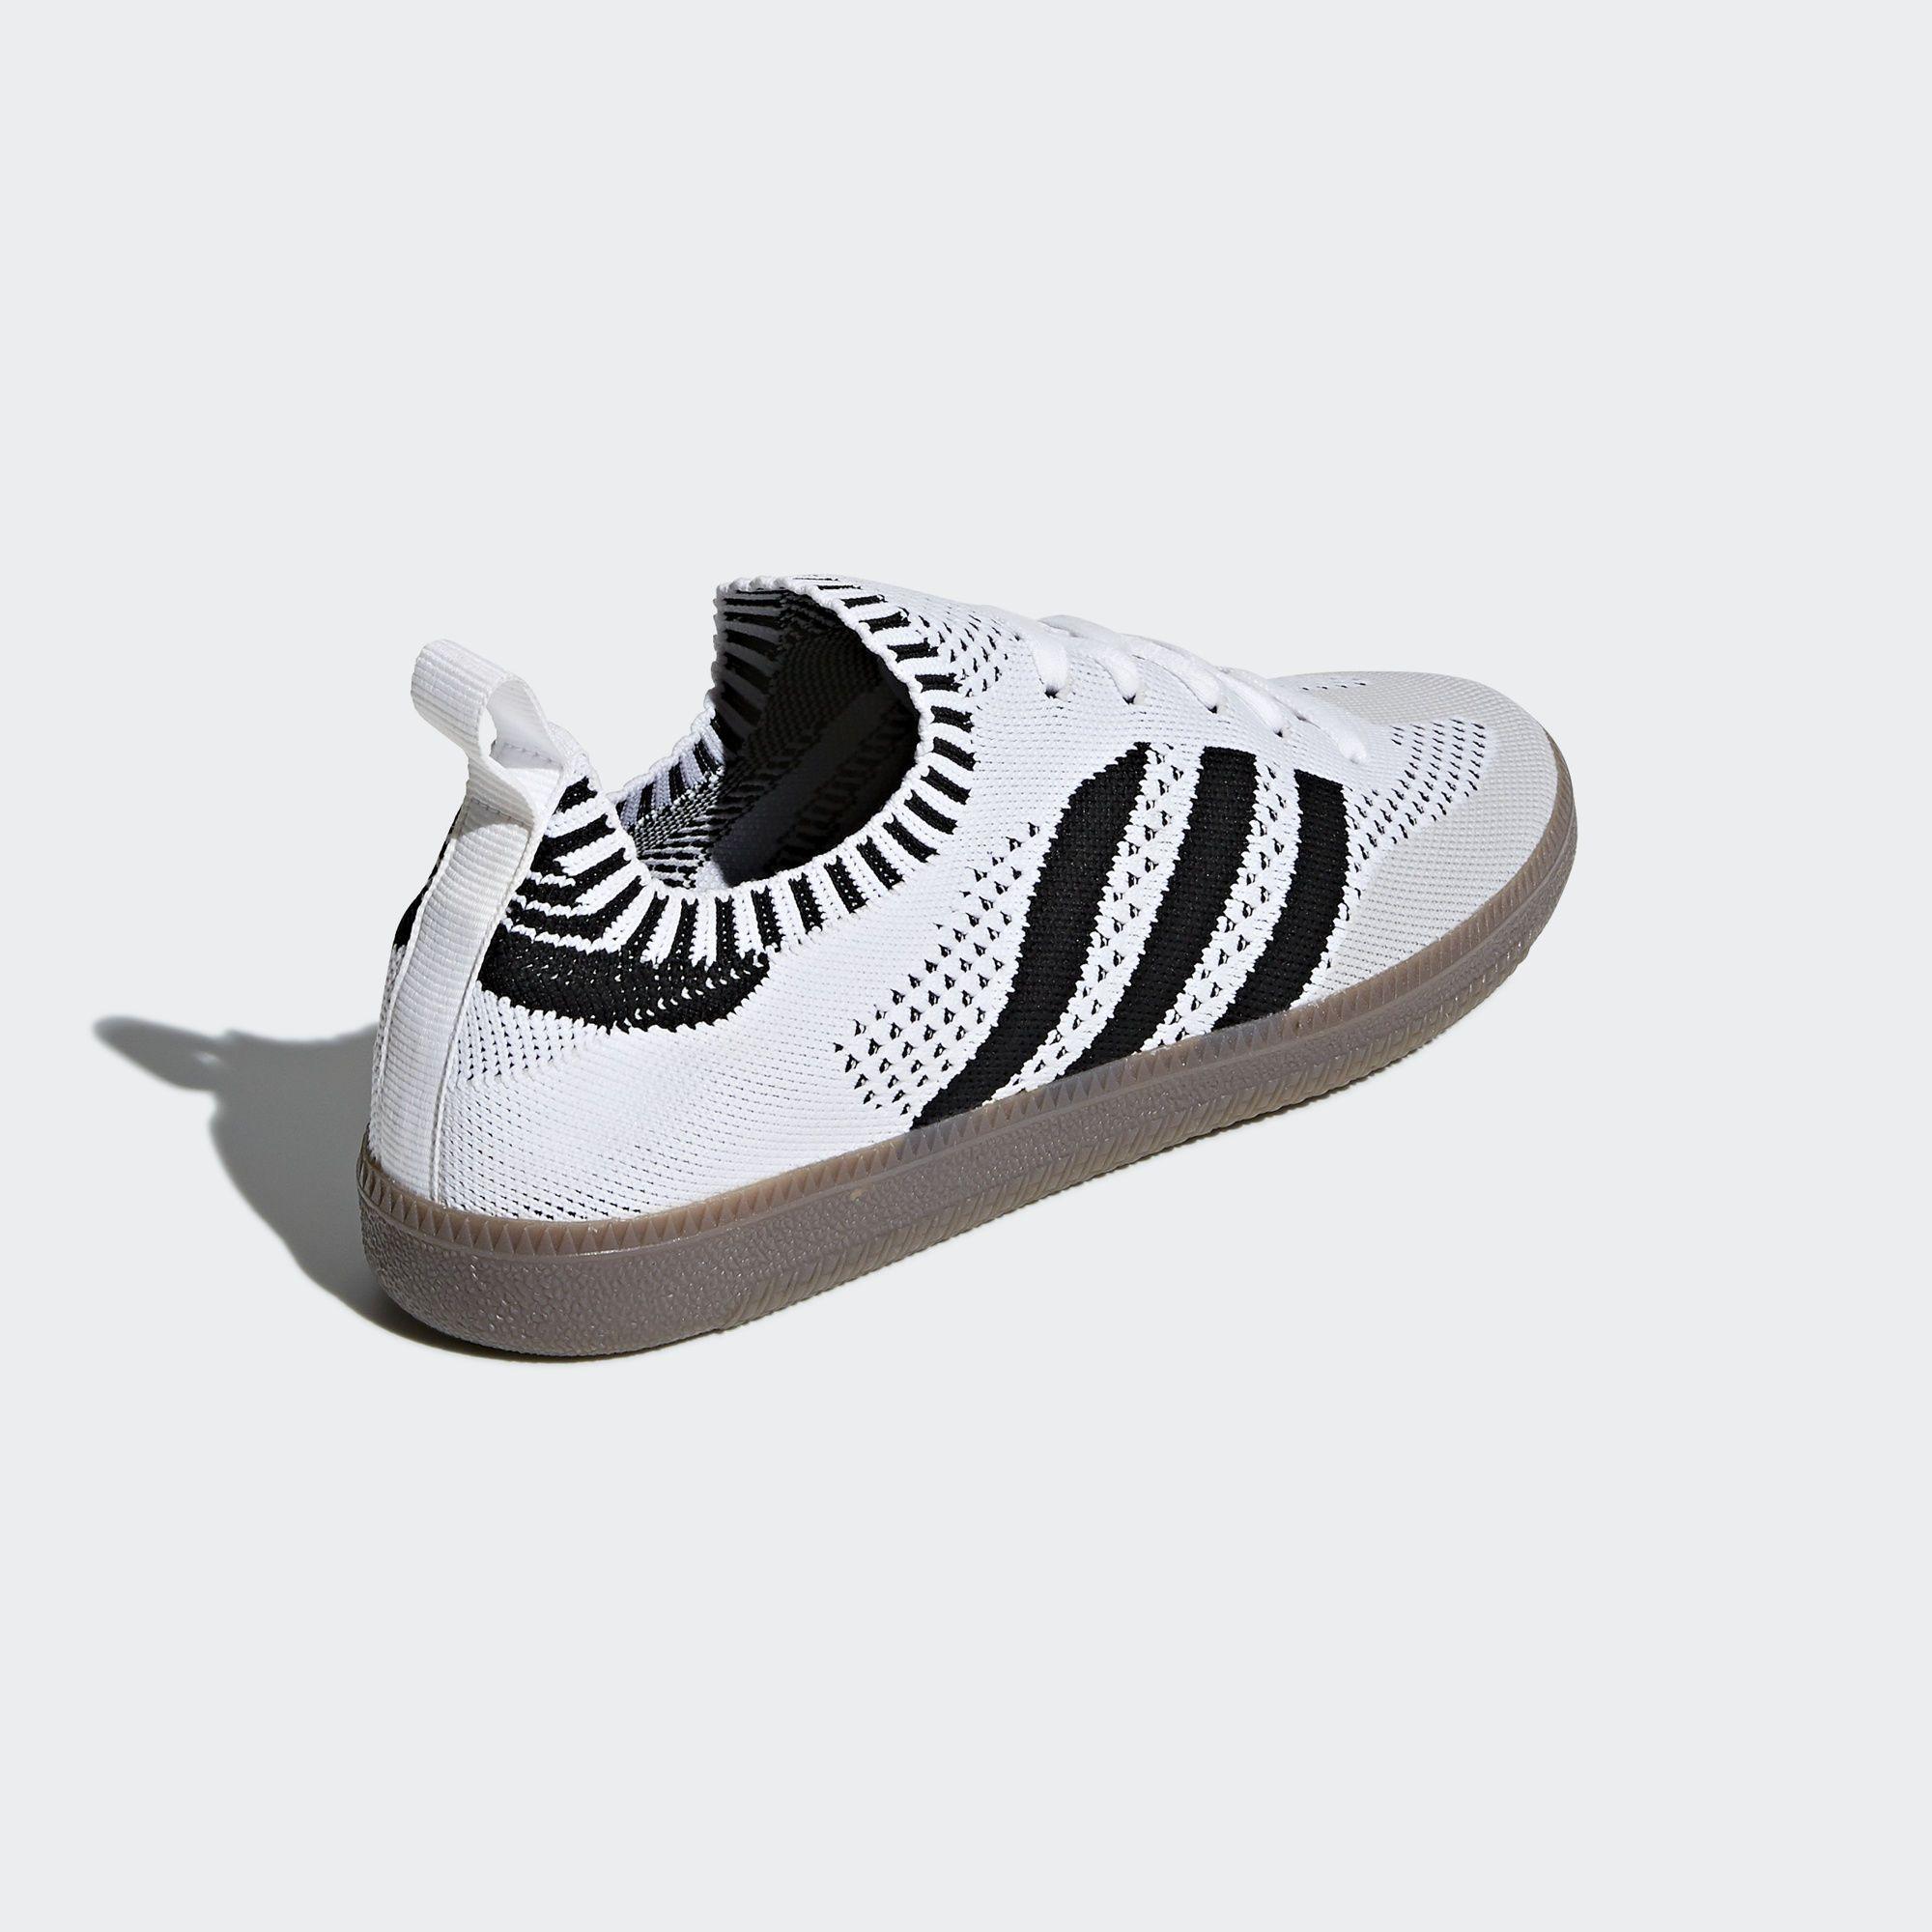 sale retailer 232e5 94781 adidas - Samba Sock Primeknit Shoes